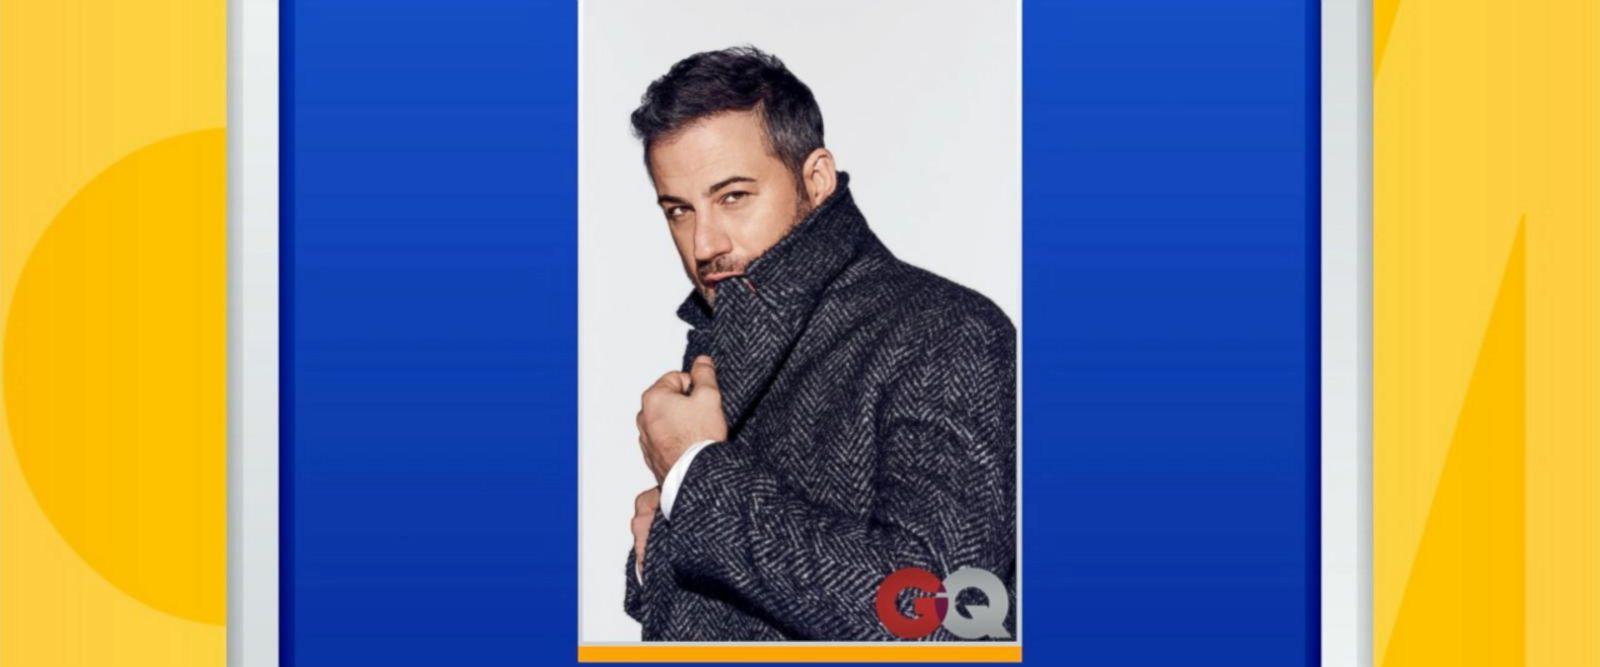 VIDEO: Jimmy Kimmel graces GQ magazine cover